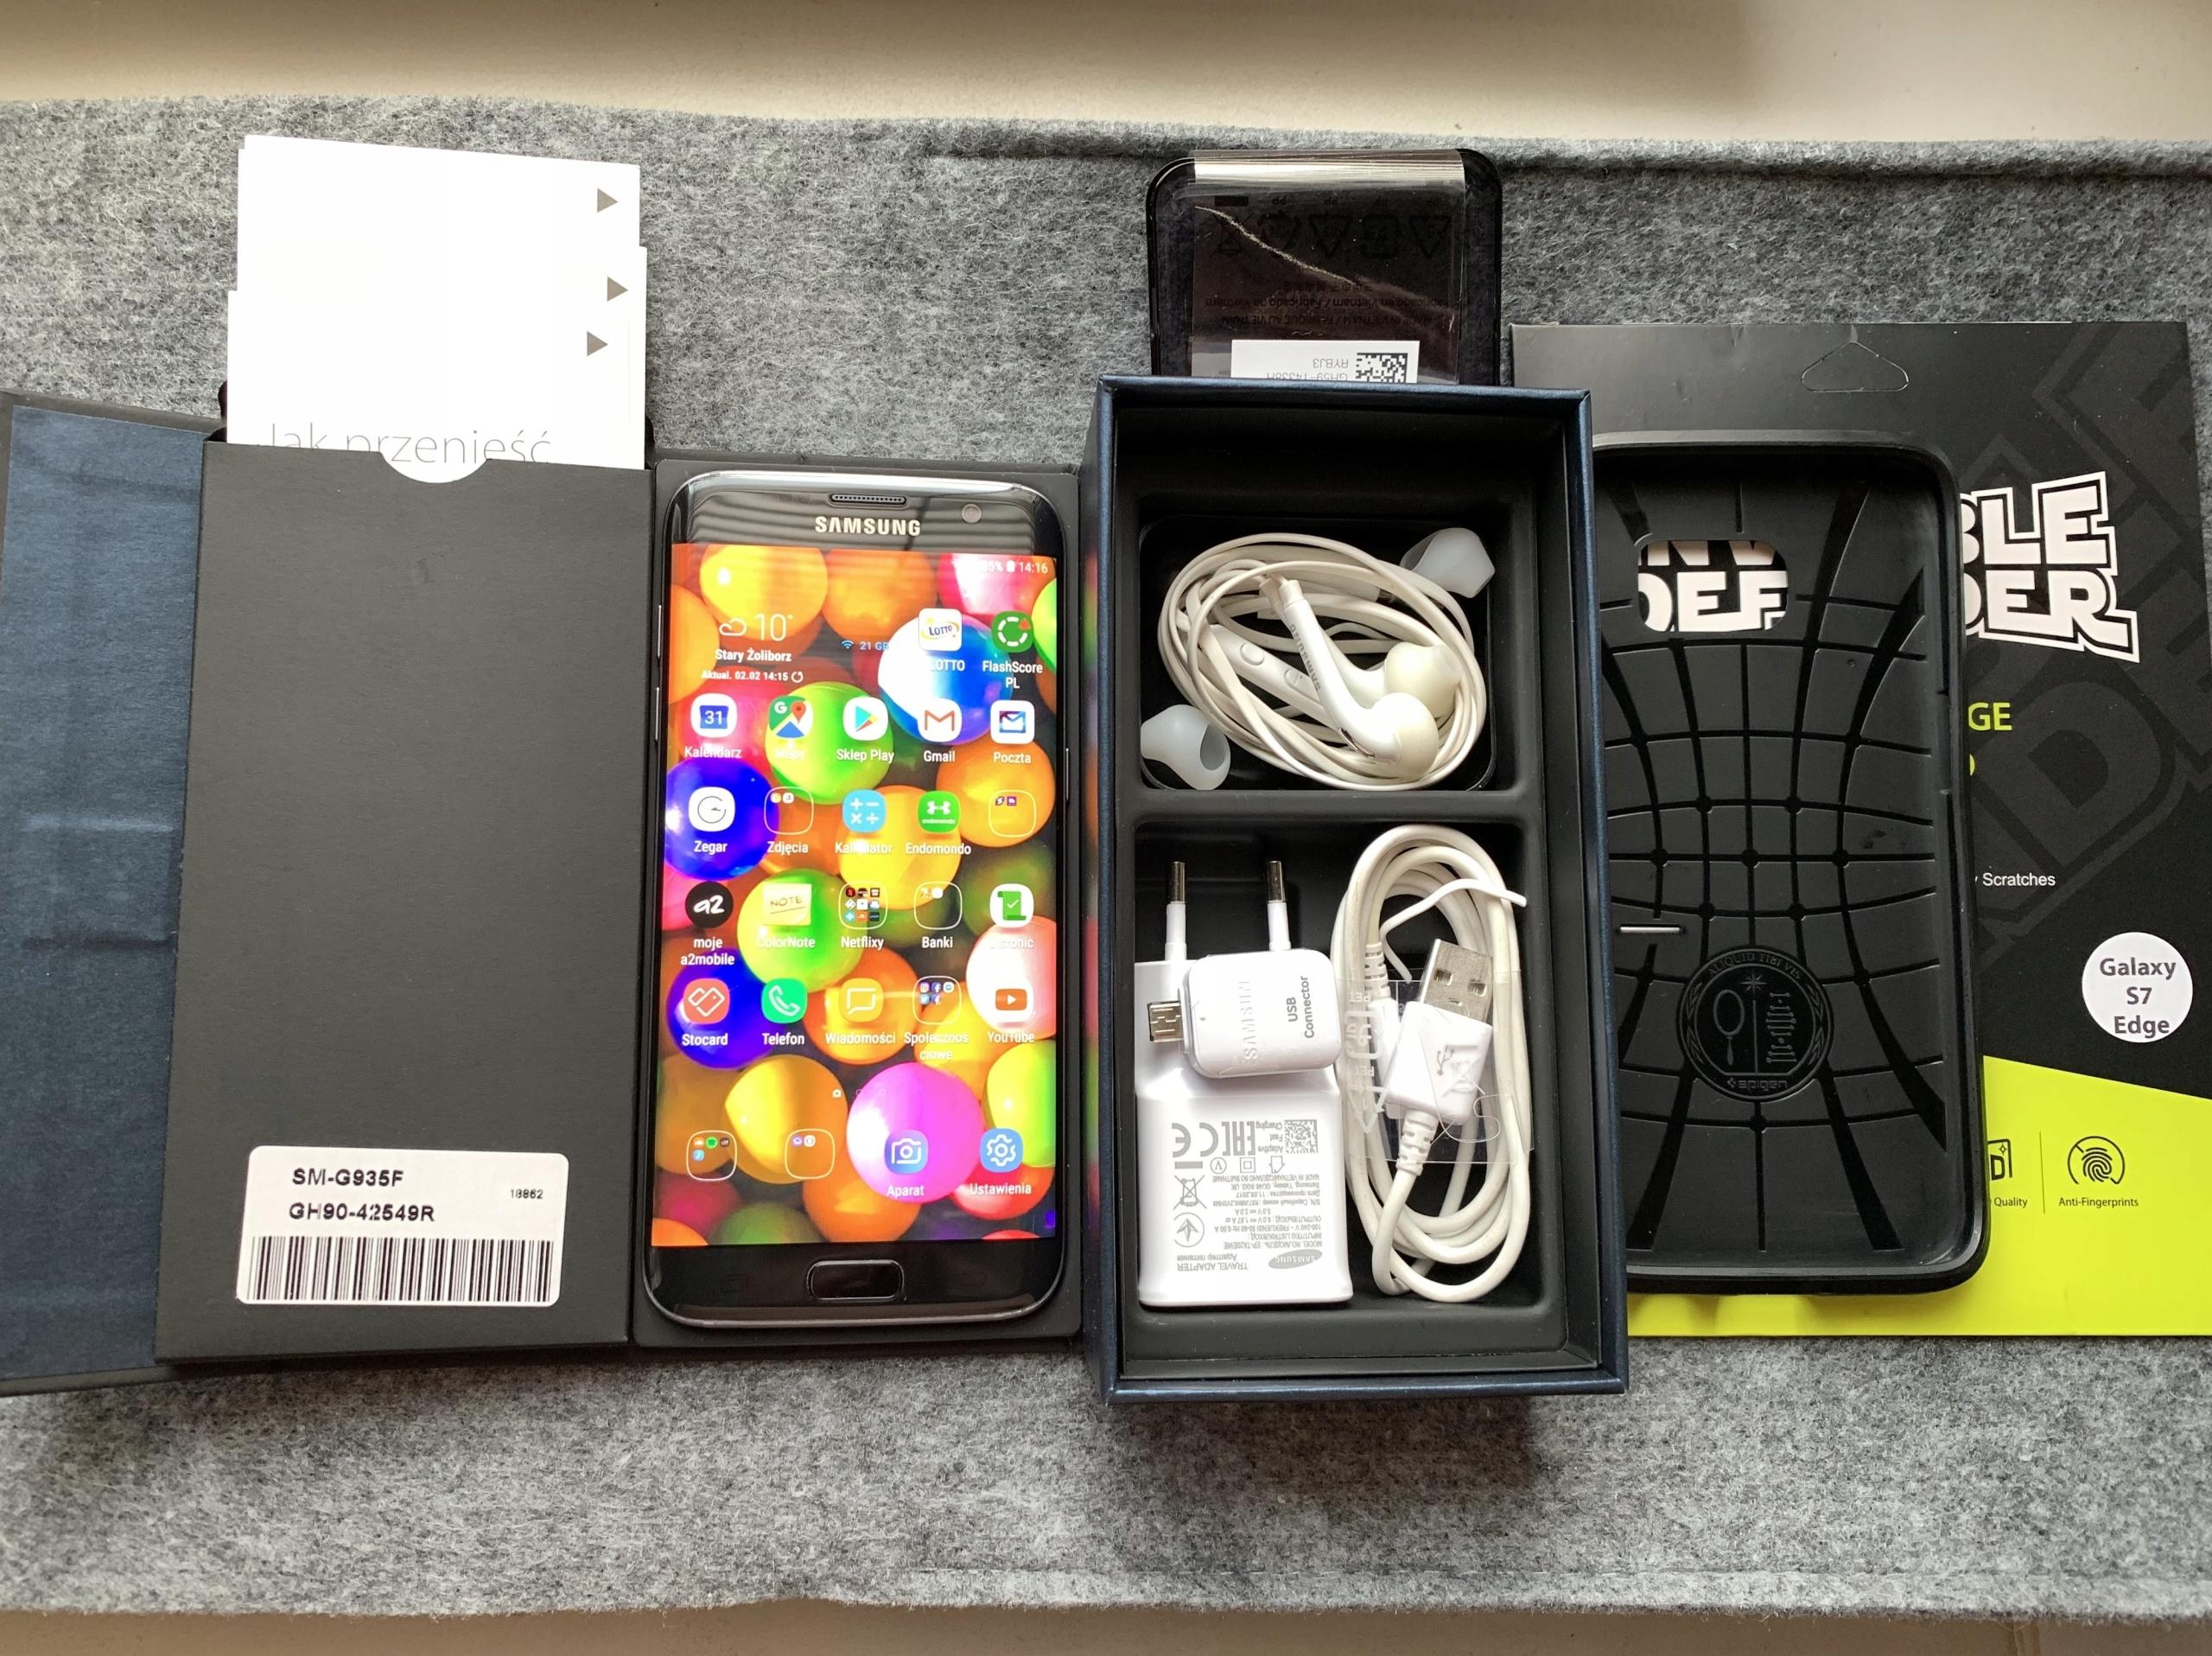 SAMSUNG S7 Edge Black Onyx dystrybucja PL